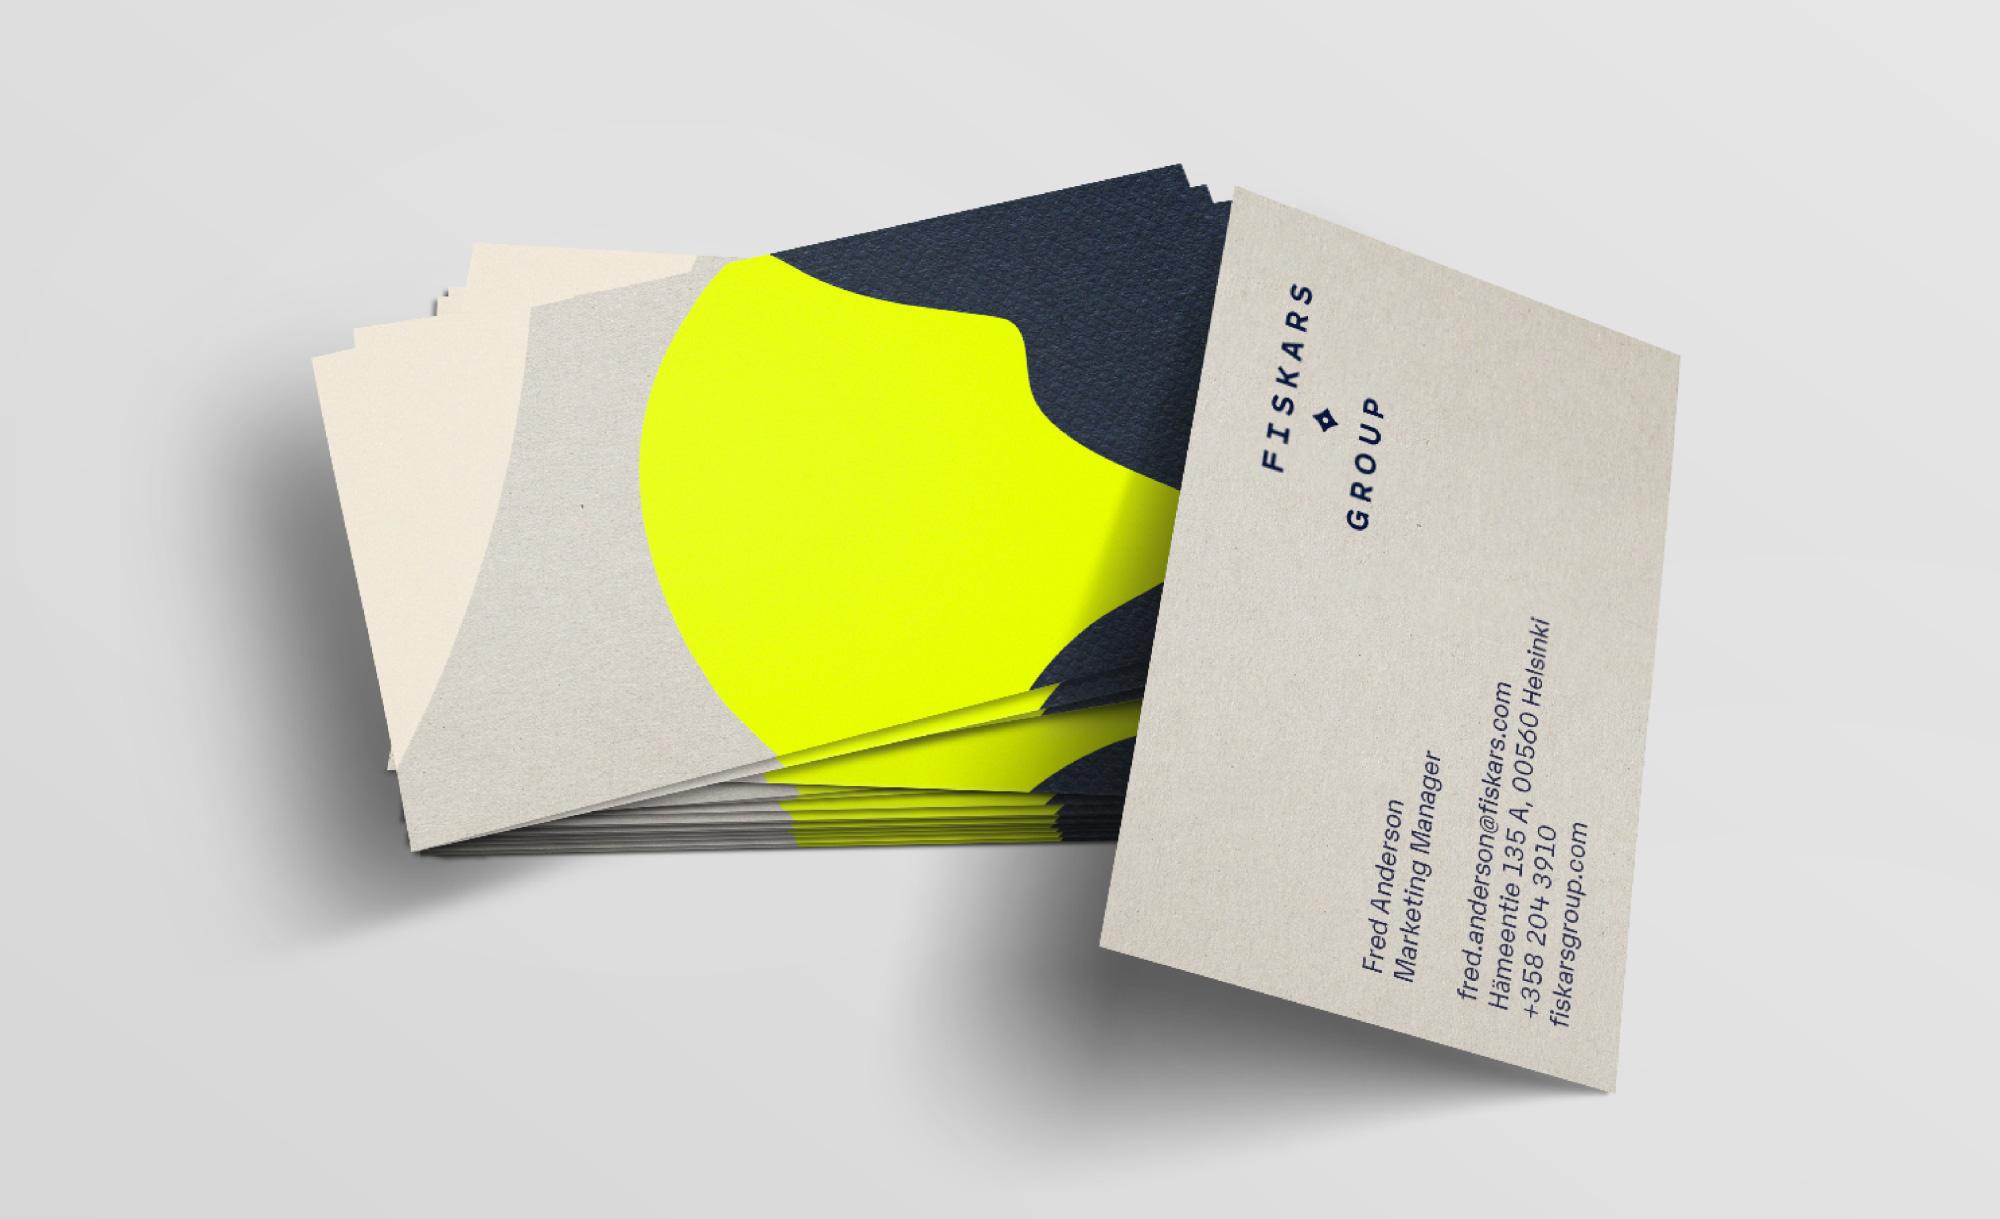 Fiskars Group 启用全新的品牌LOGO和VI形象设计-vi设计7